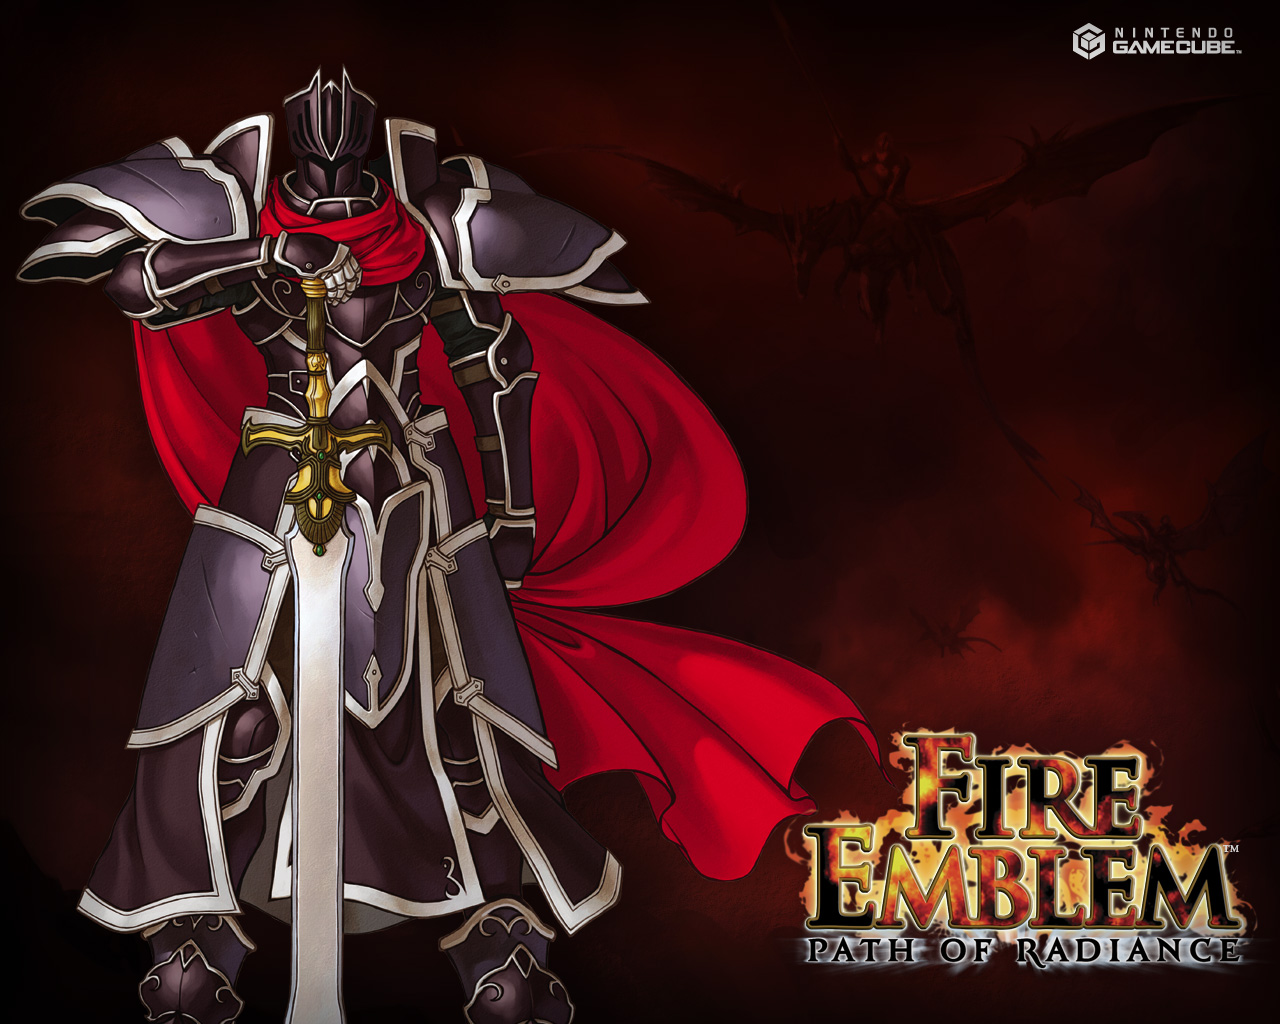 Fire Emblem Desktop Wallpaper: Fire Emblem Fates Wallpapers